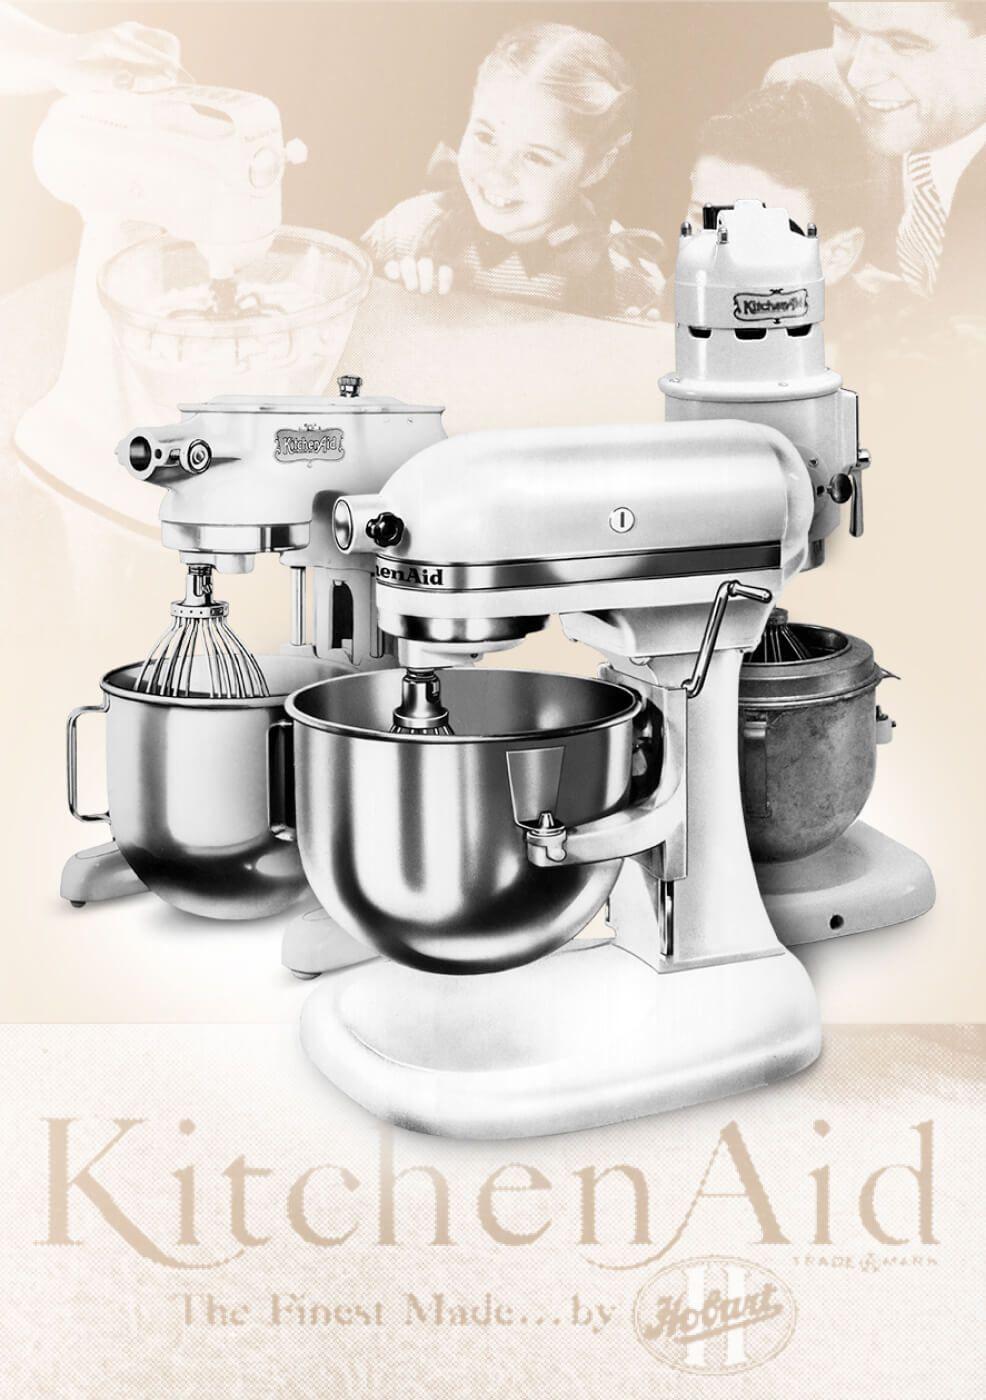 Maker Inspired Stand Mixers | KitchenAid